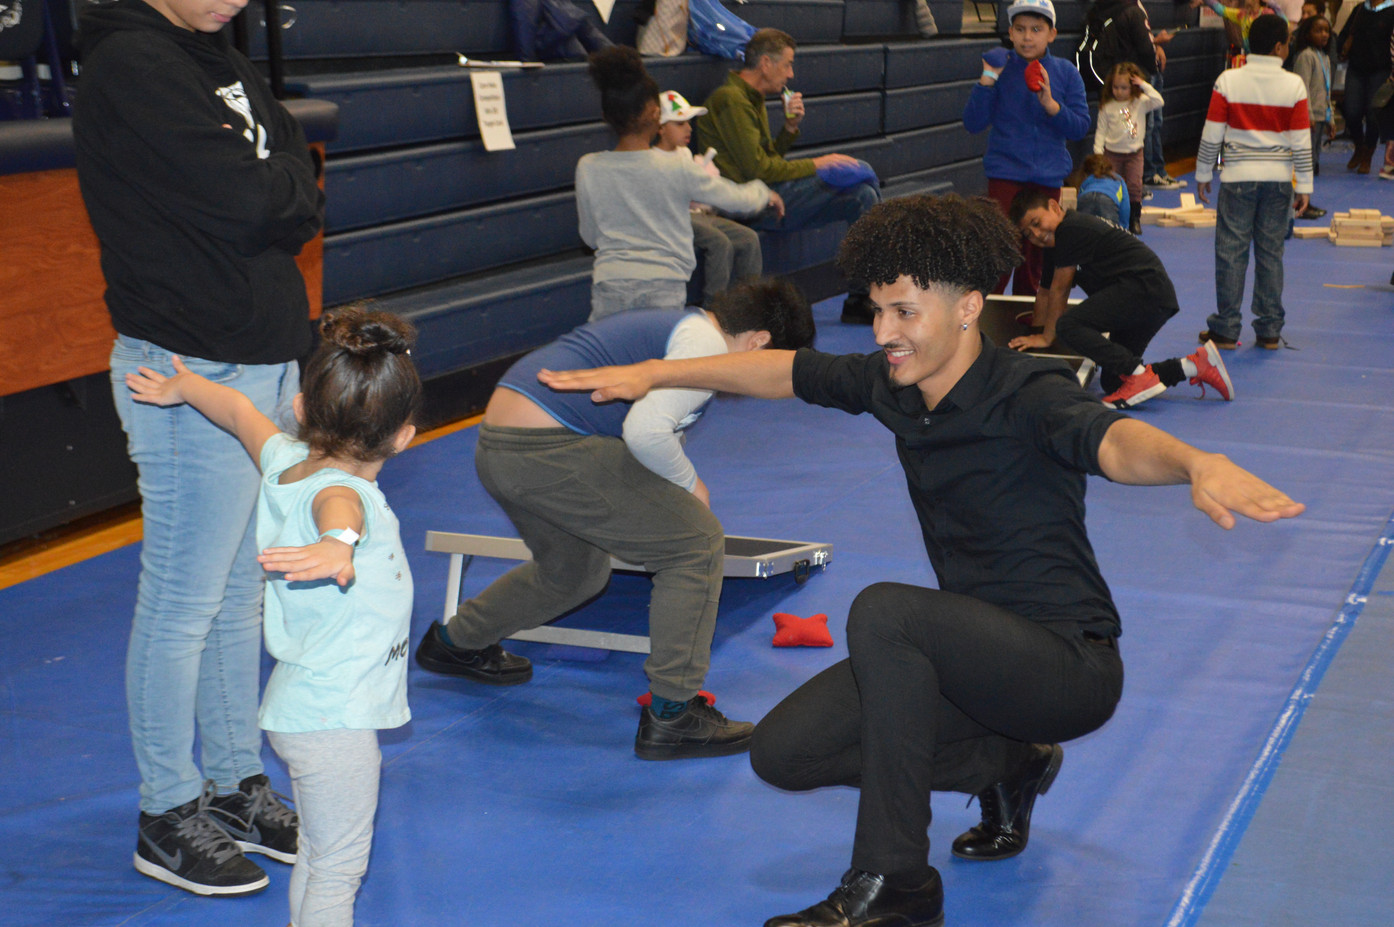 Motivational-Dancer-Teaches-With-Kid.JPG